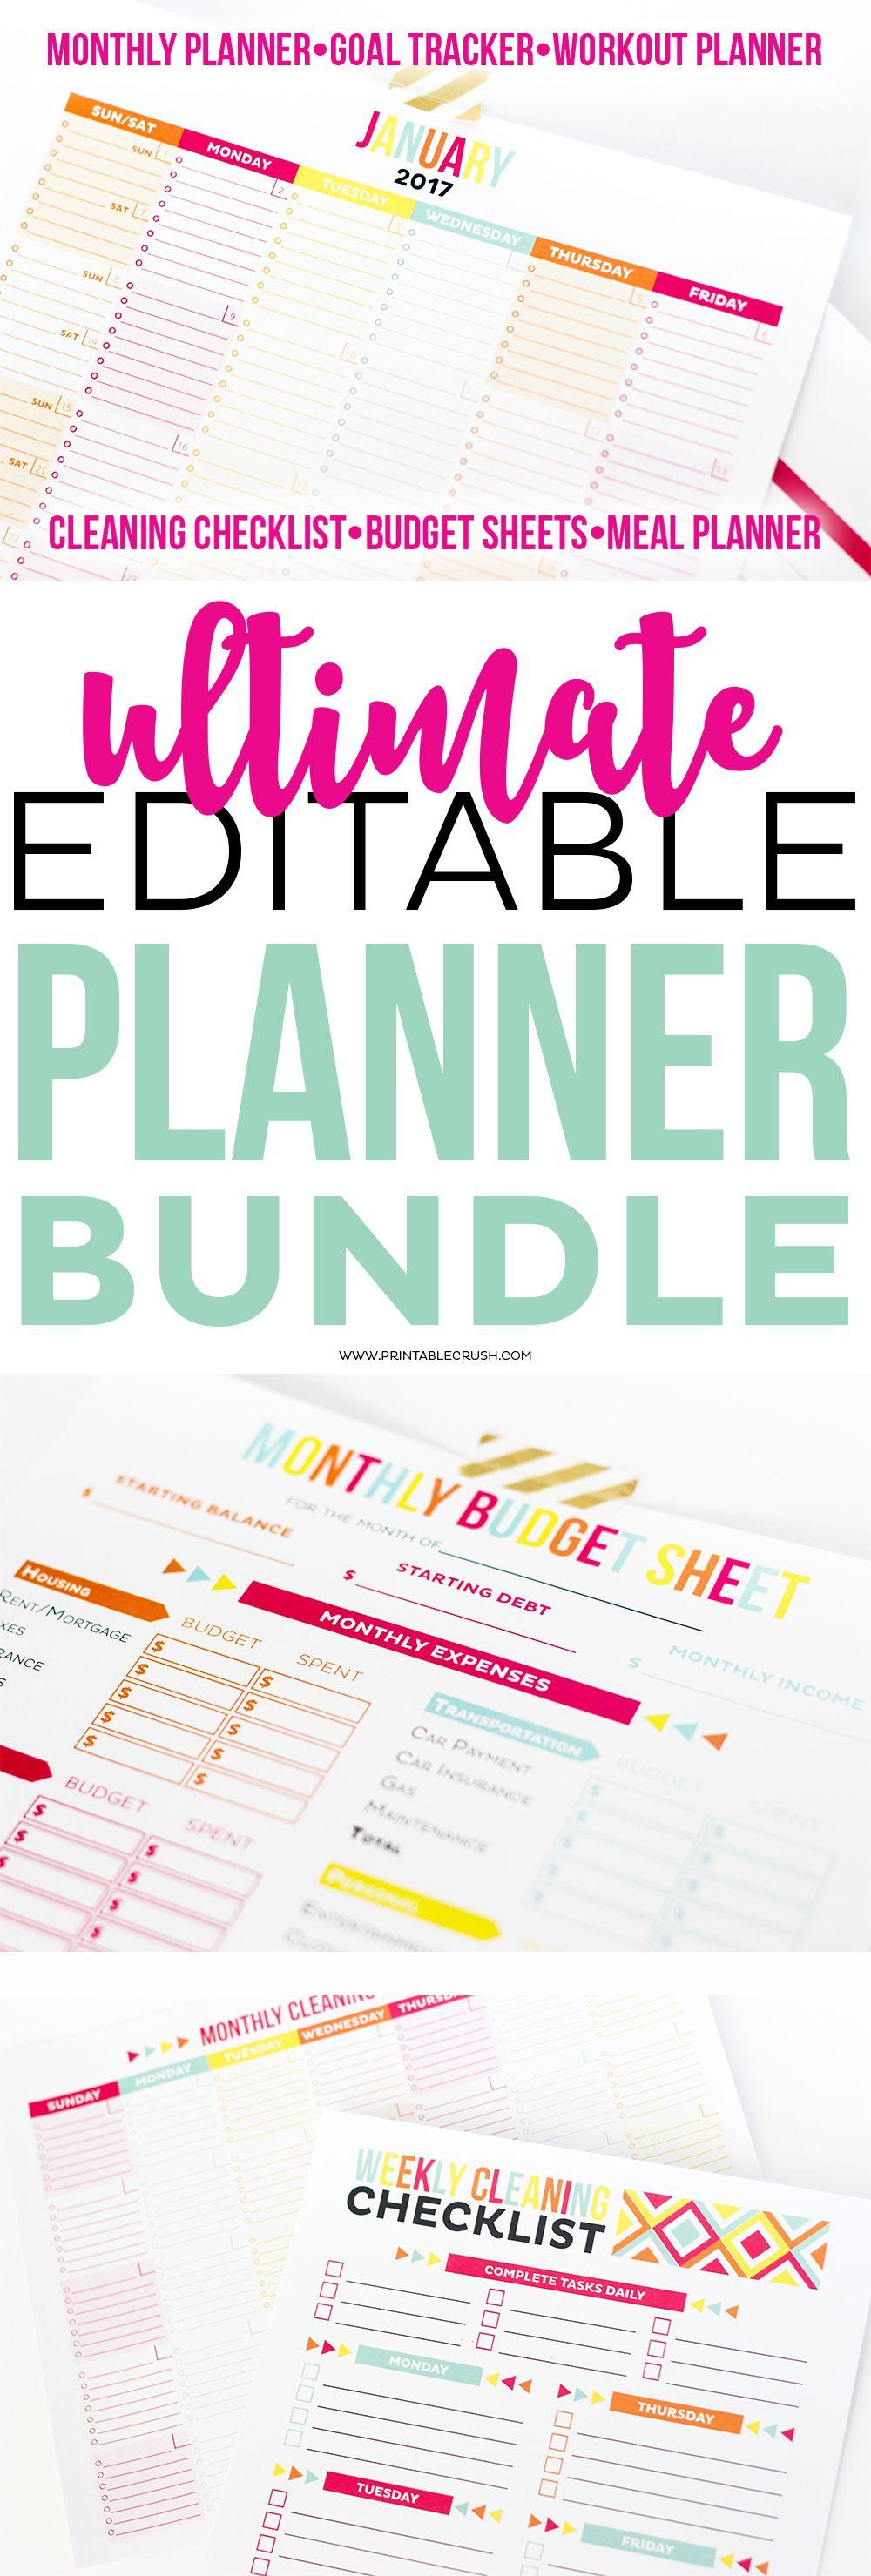 Ultimate Editable Planner Bundle Set of 5 (20off